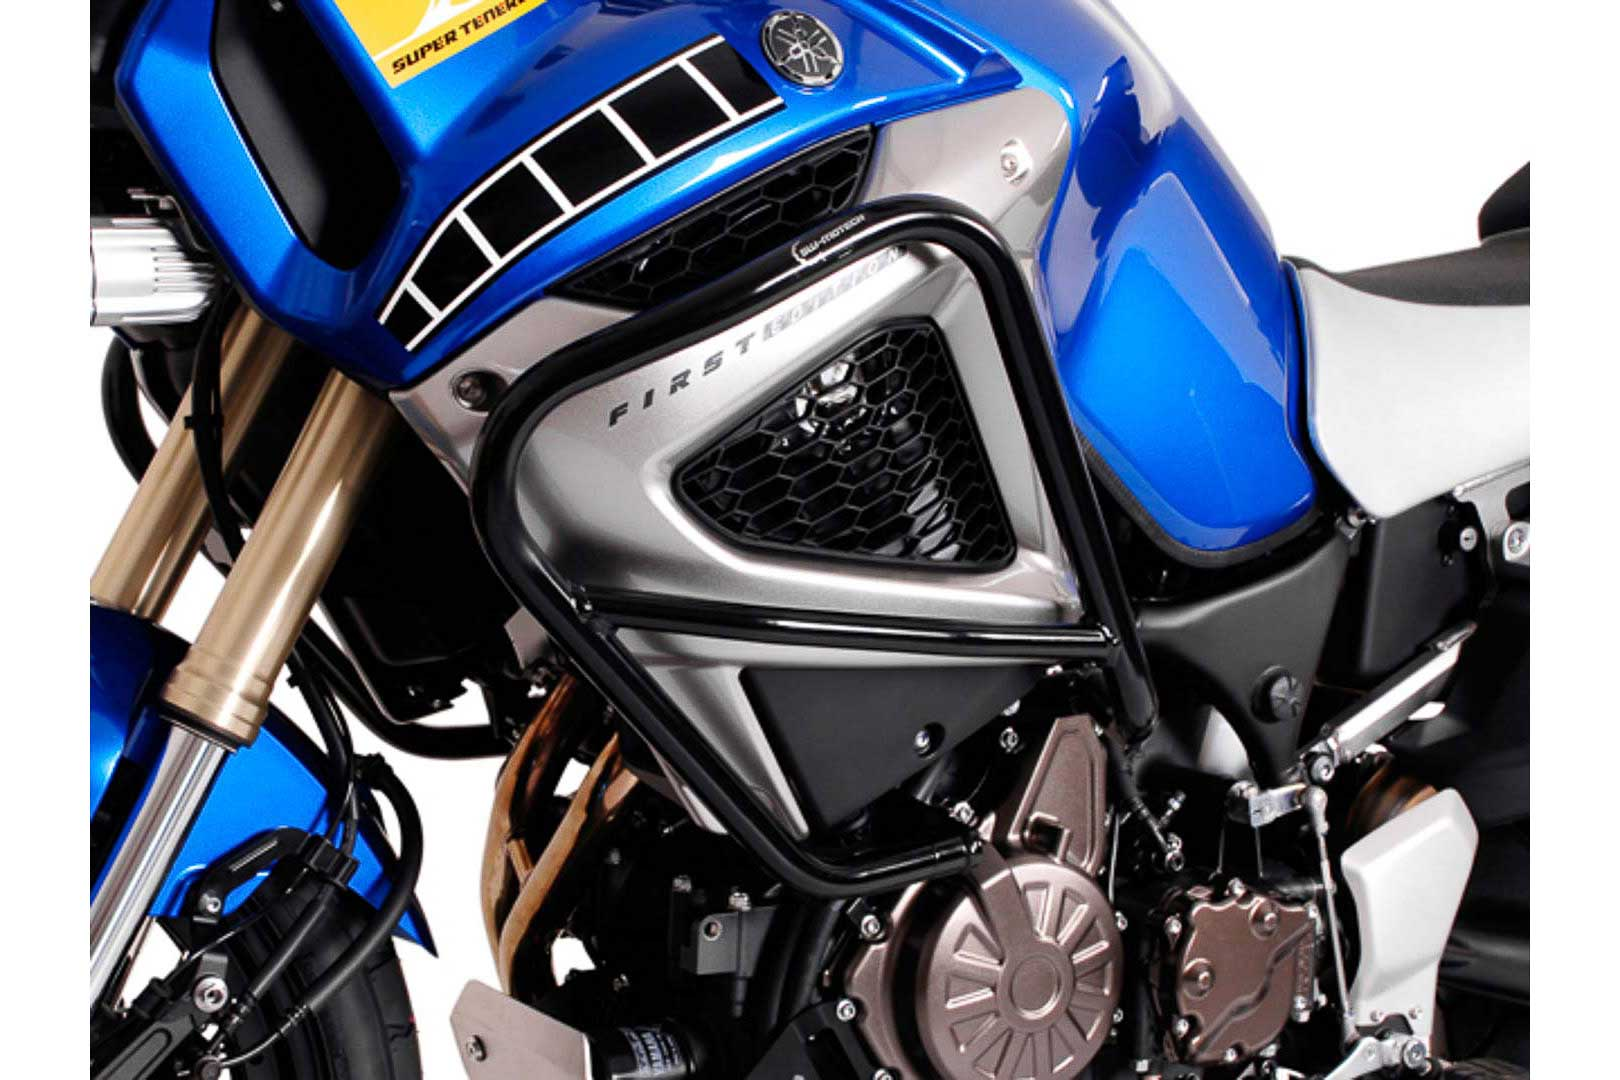 SW-Motech Moottorinsuojarauta Yamaha XT1200Z Super Tenere, musta